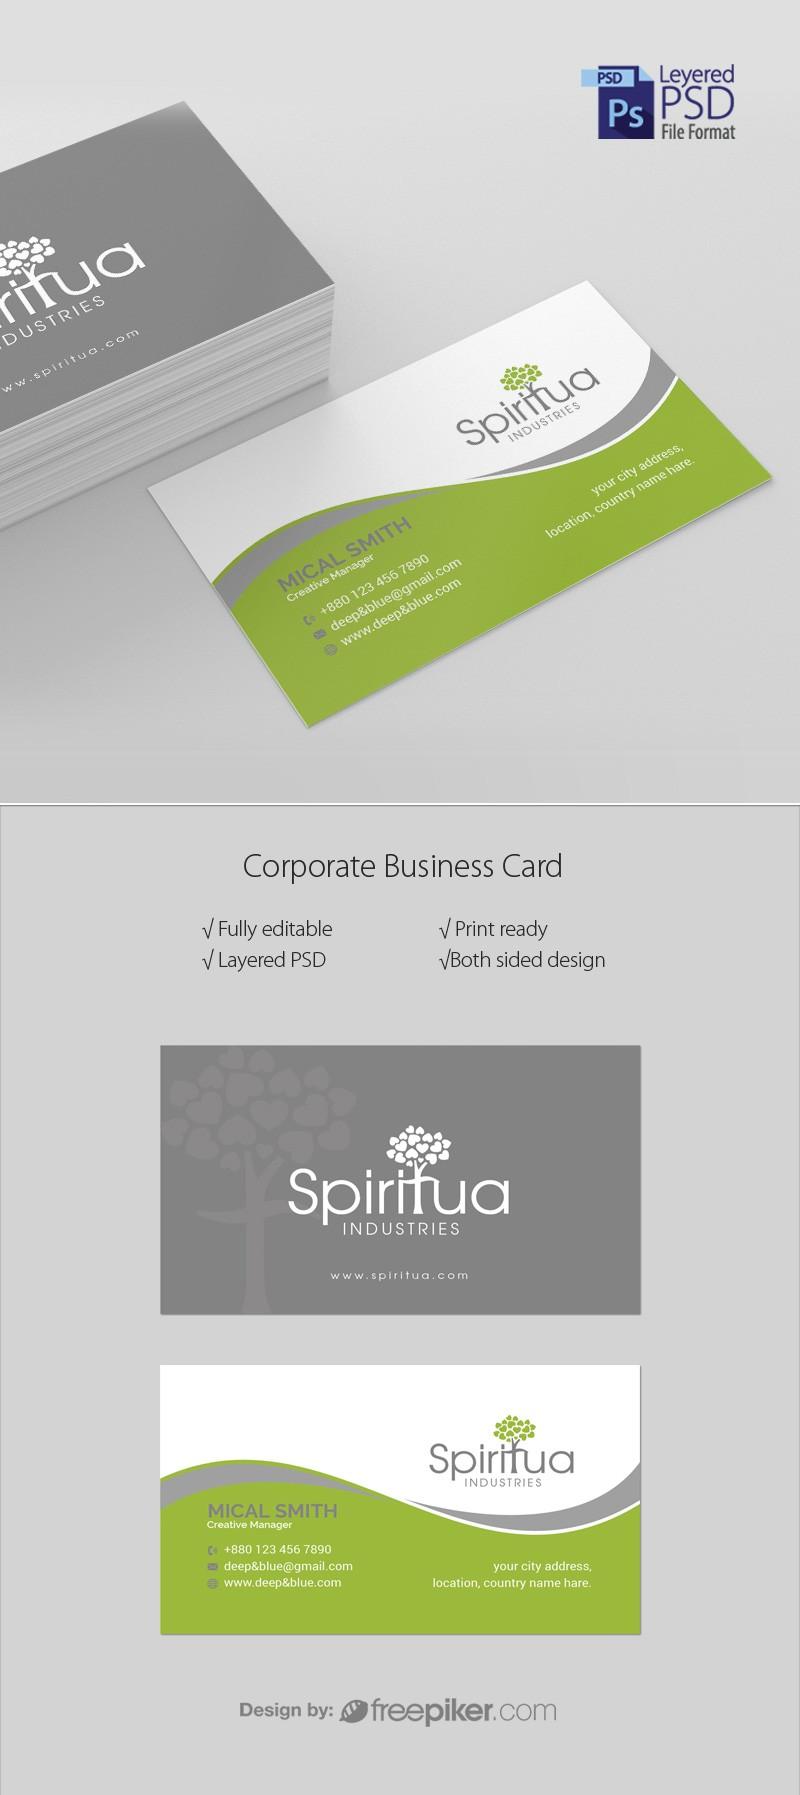 Freepiker | corporate business card